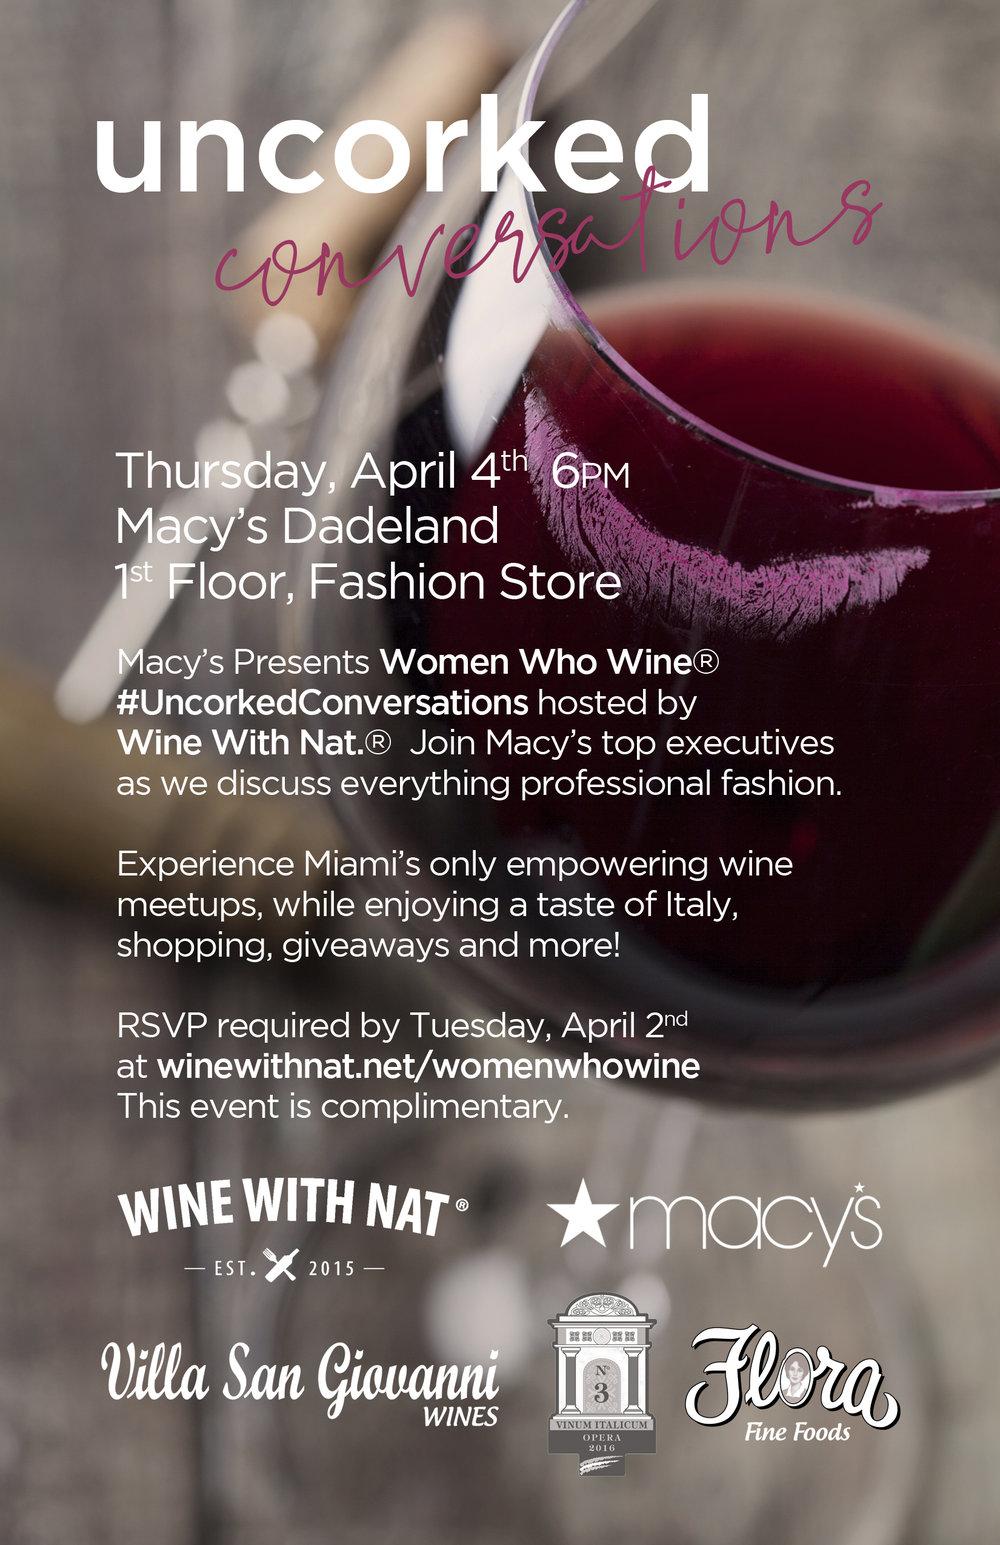 Wine With Nat-Women Who Wine Uncorked Conversations Event-Macys.jpg